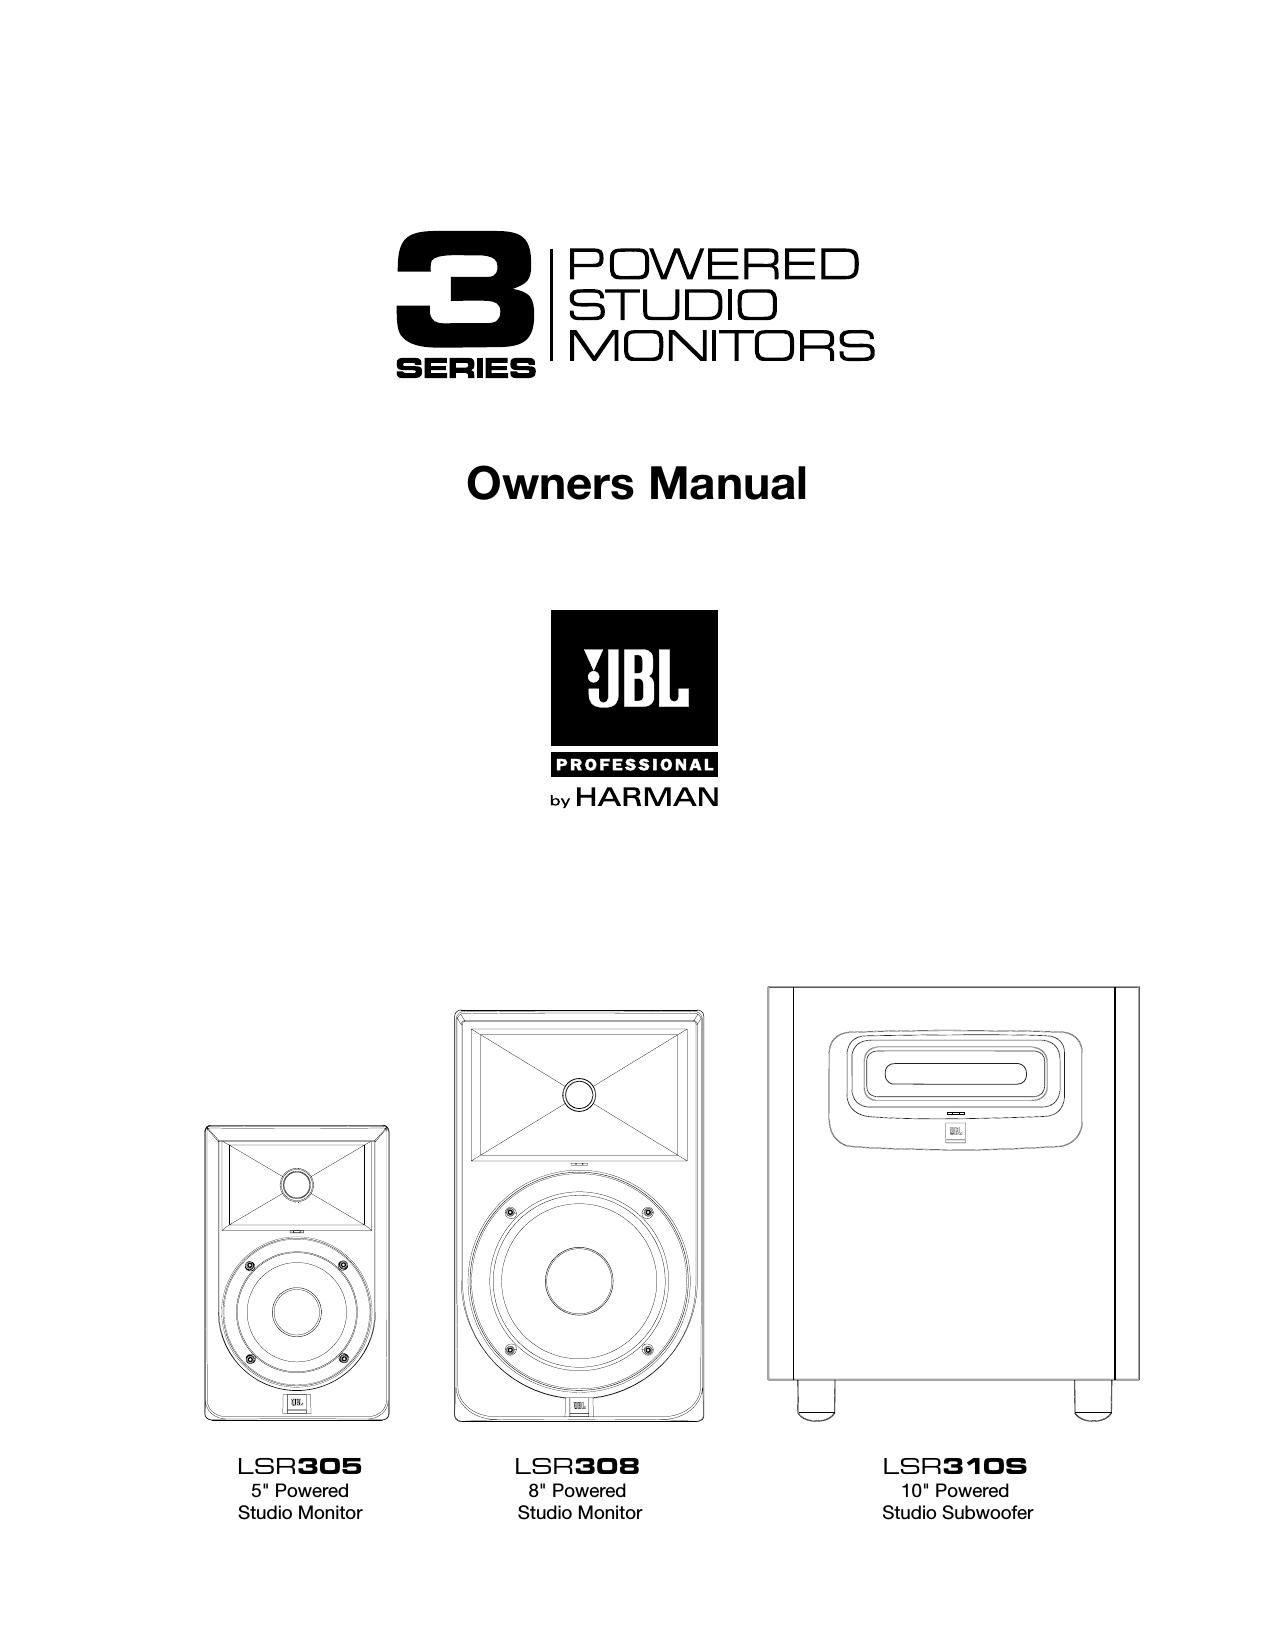 jbl lsr 308 owners manual rh audioservicemanuals com jbl e40bt owners manual jbl xtreme owner manual